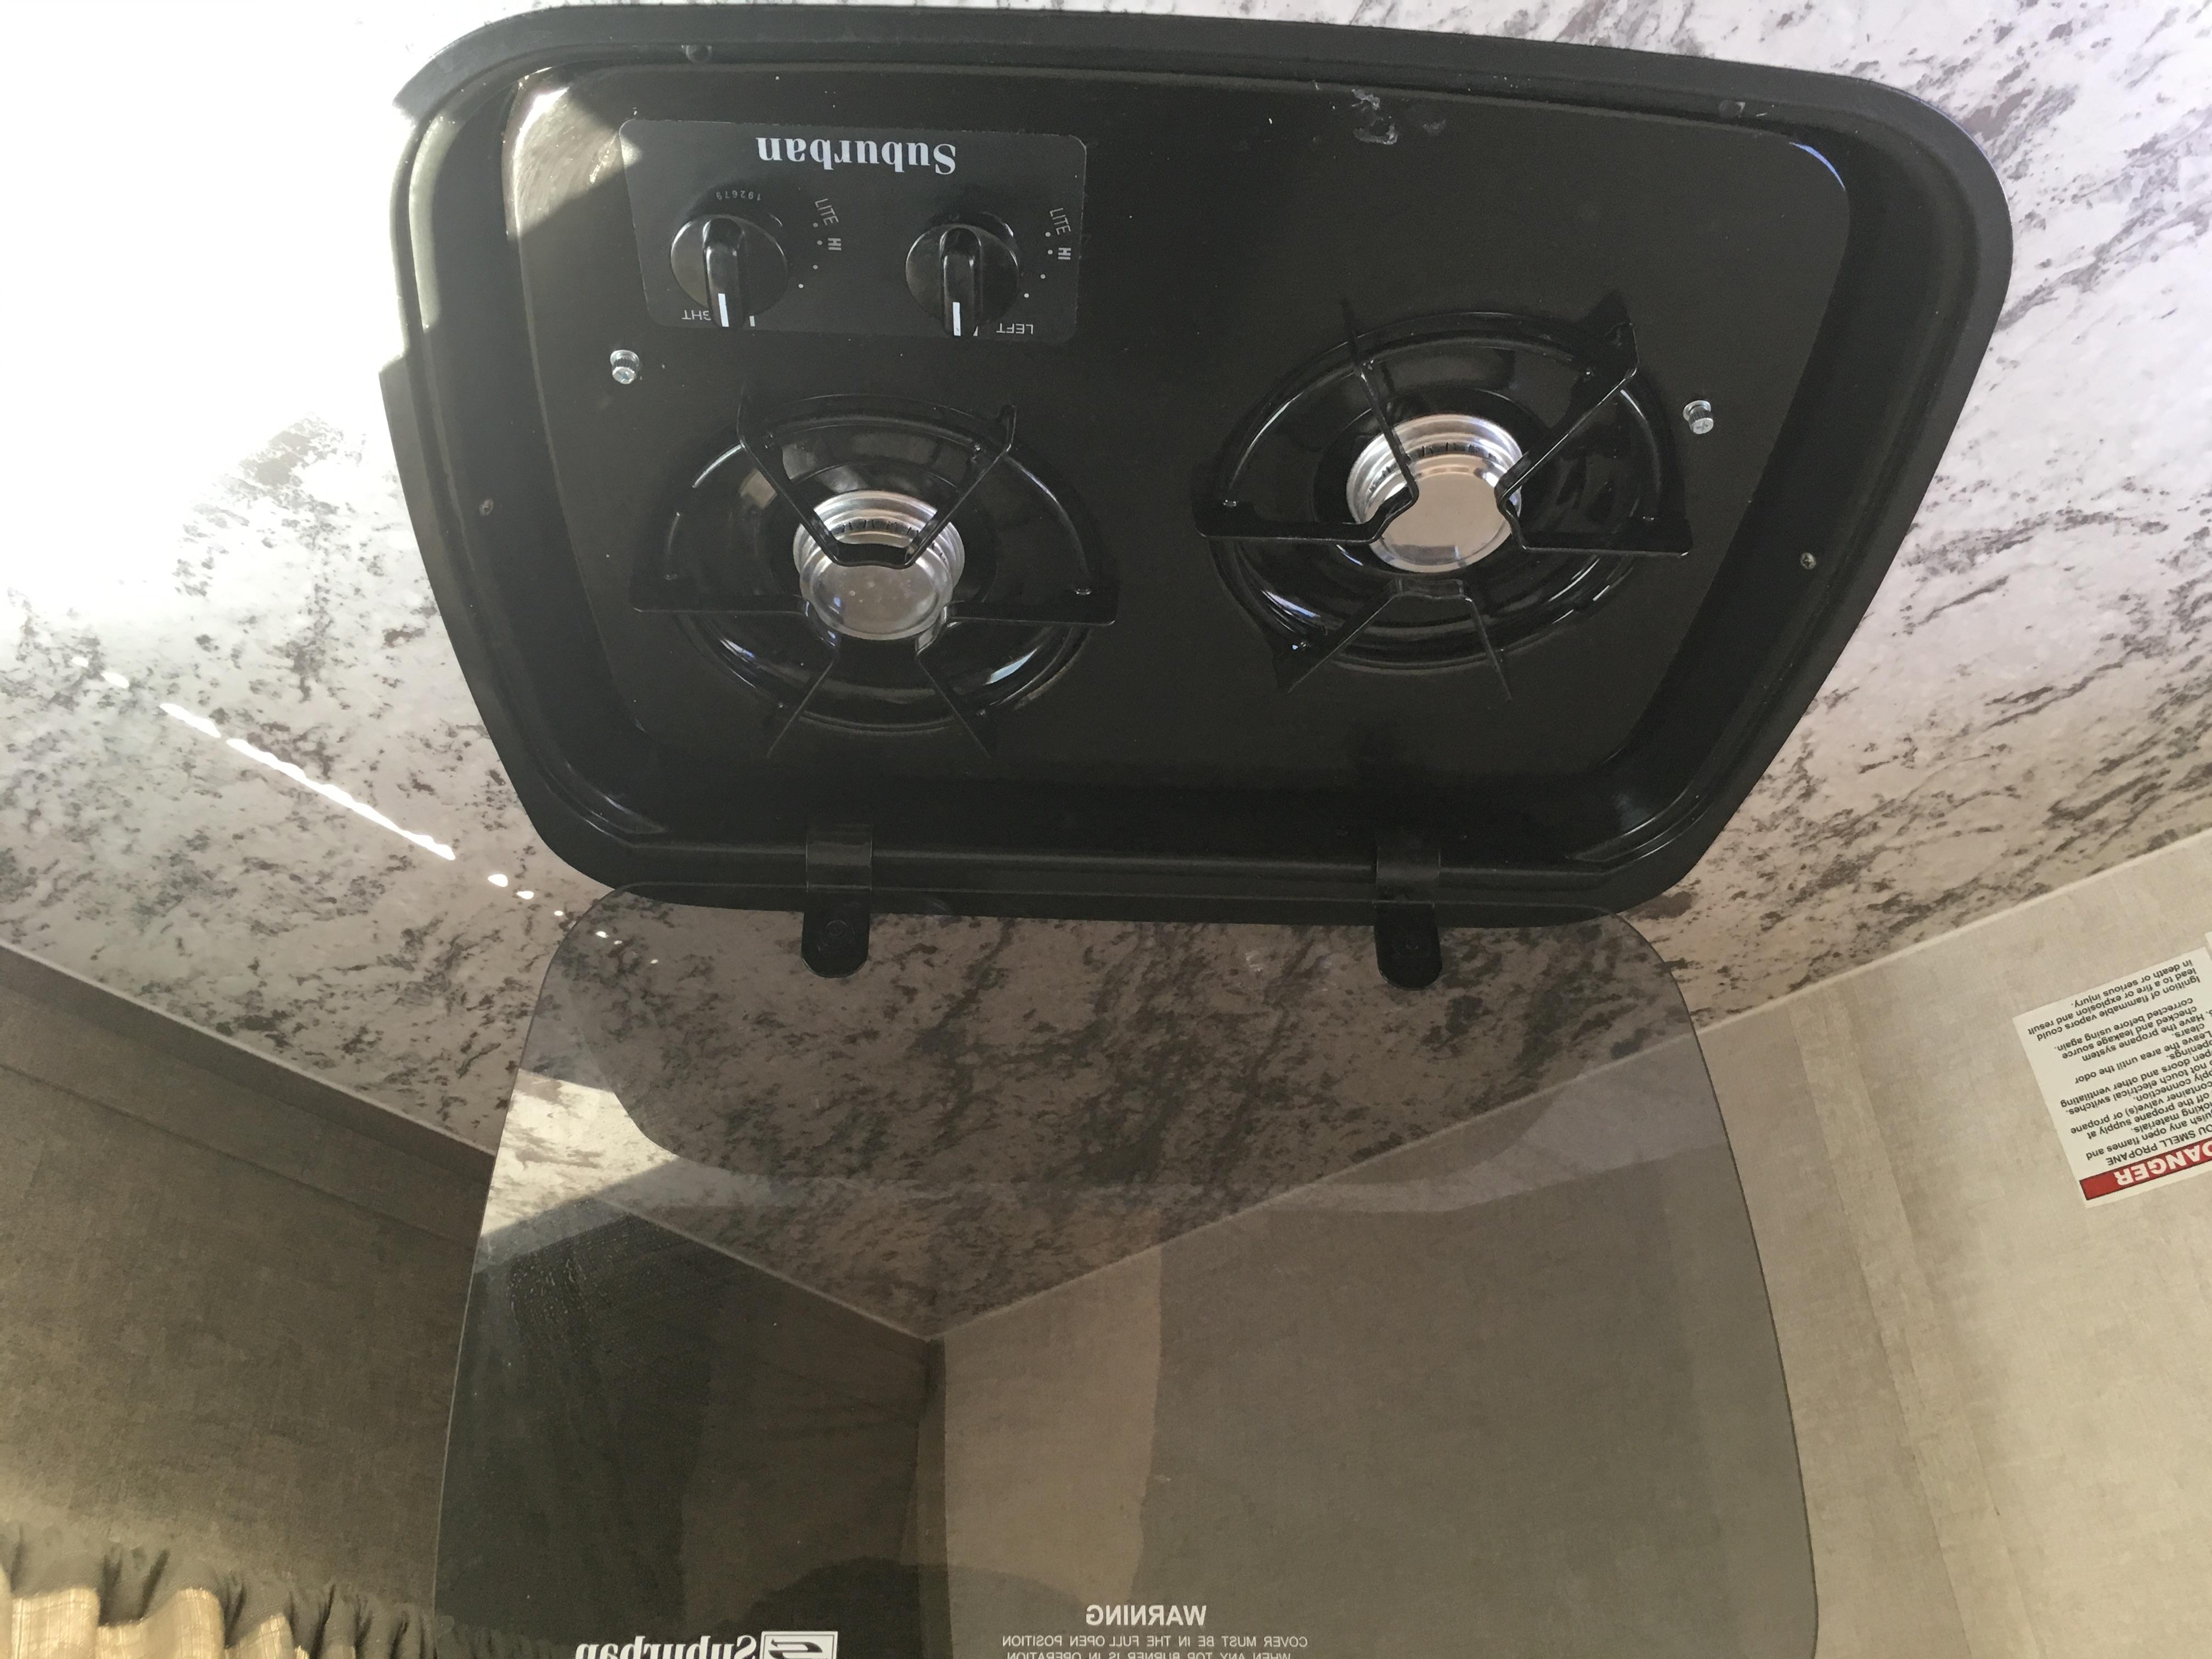 Two burner propane cooktop.